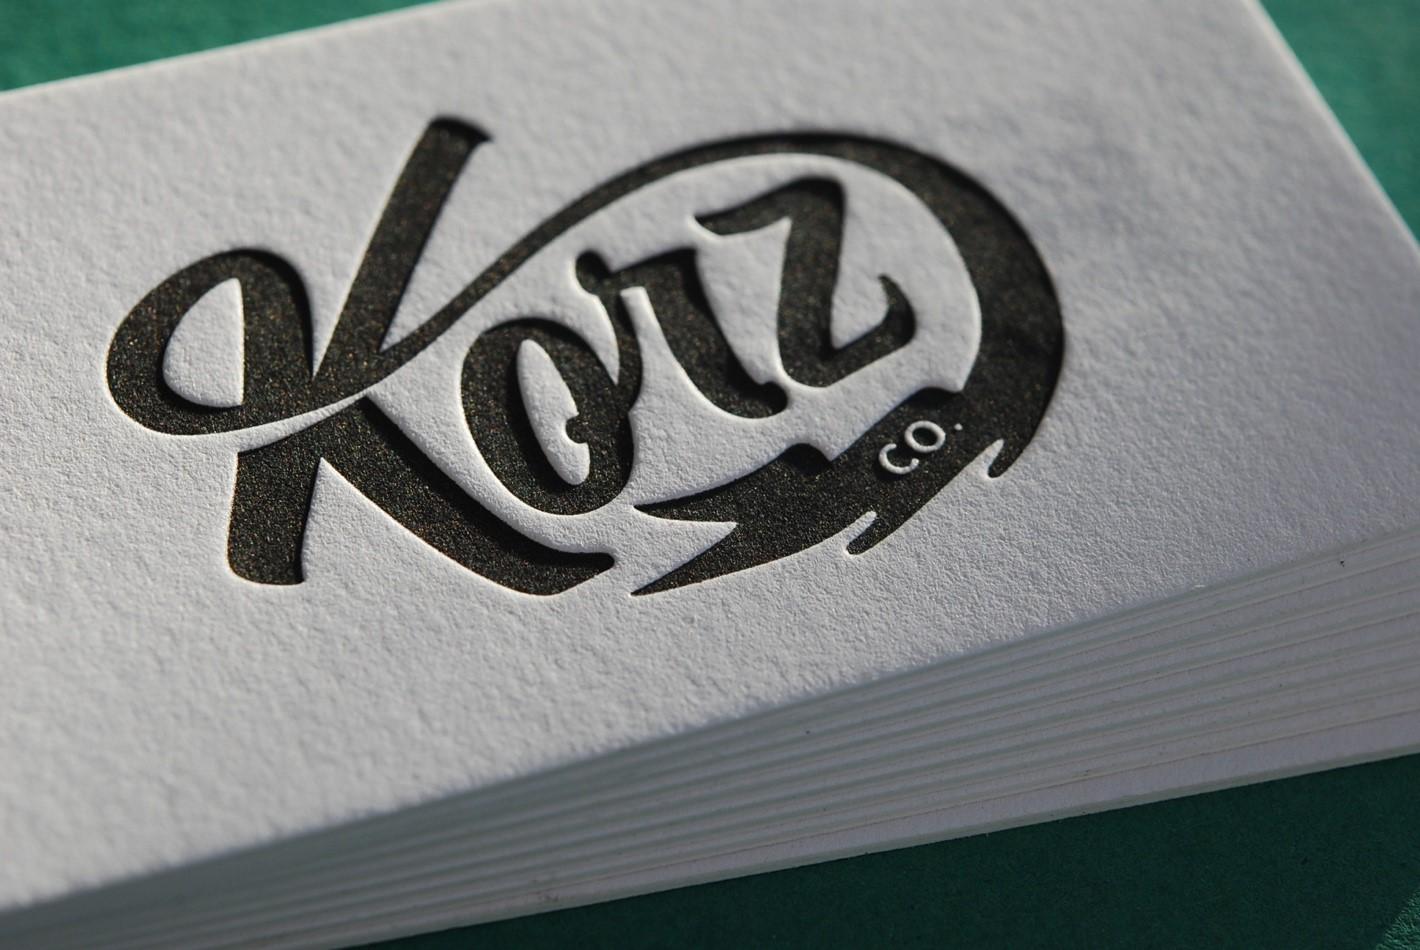 korz4.jpg